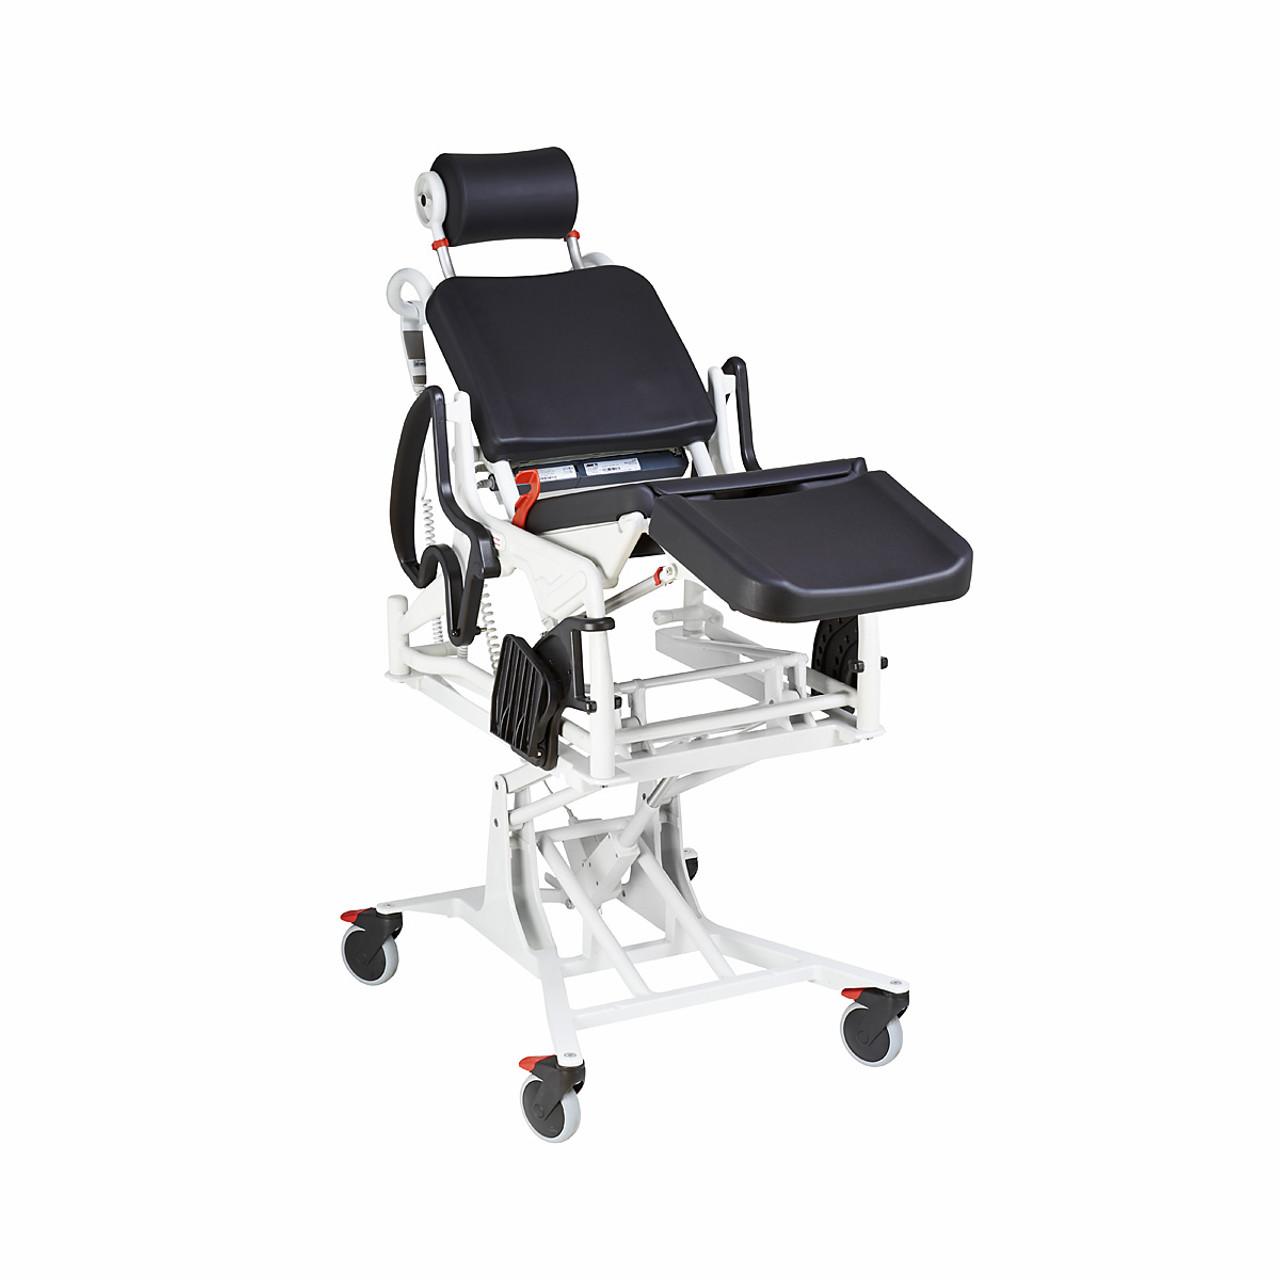 Rebotec Electric Tilt Lift Power Commode Shower Chair